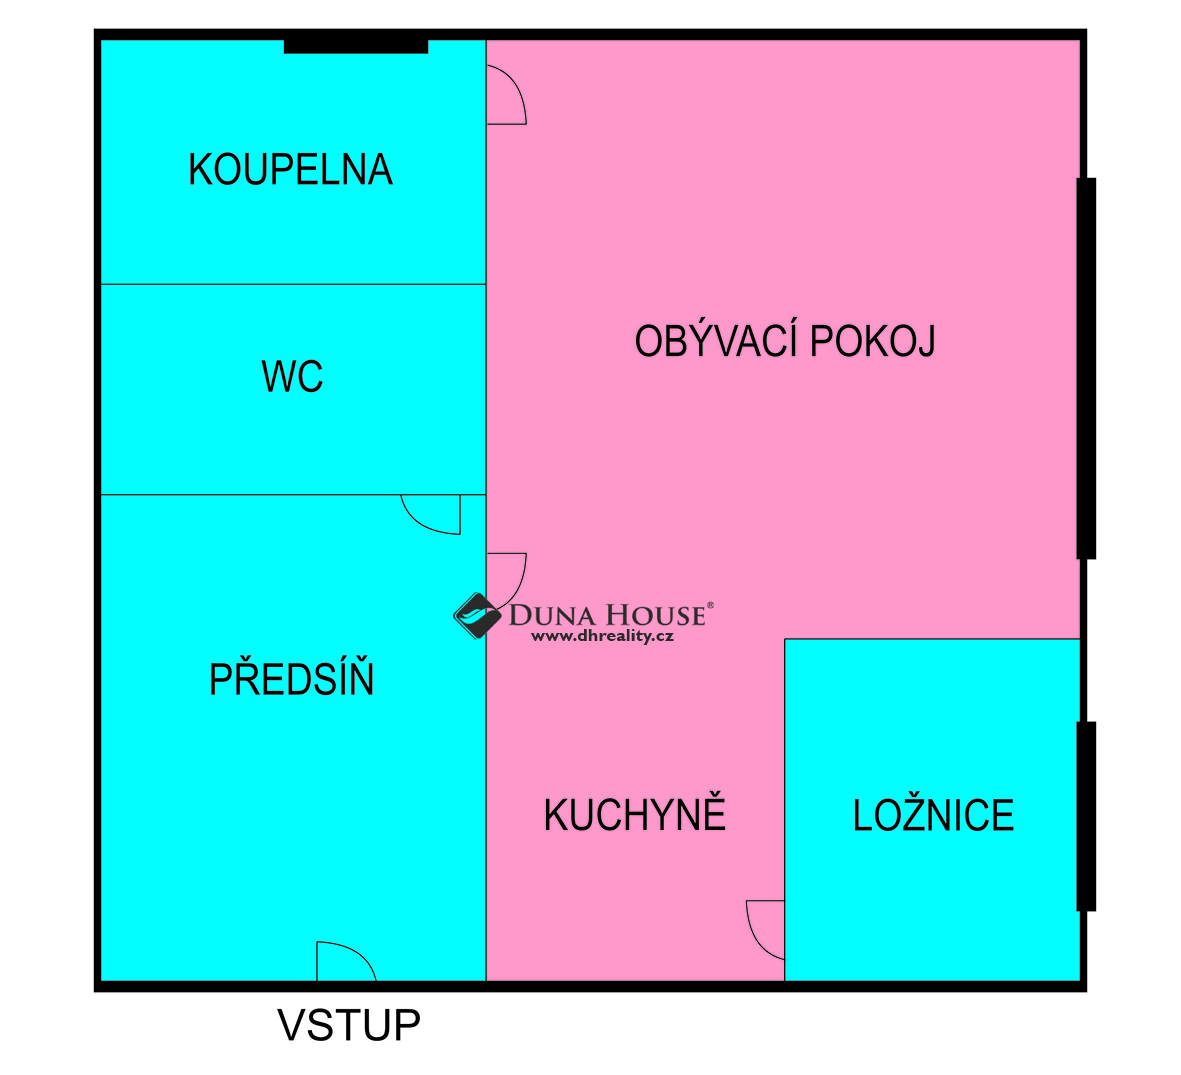 Prodej bytu, U Družstva Ideál, Praha 4 Nusle